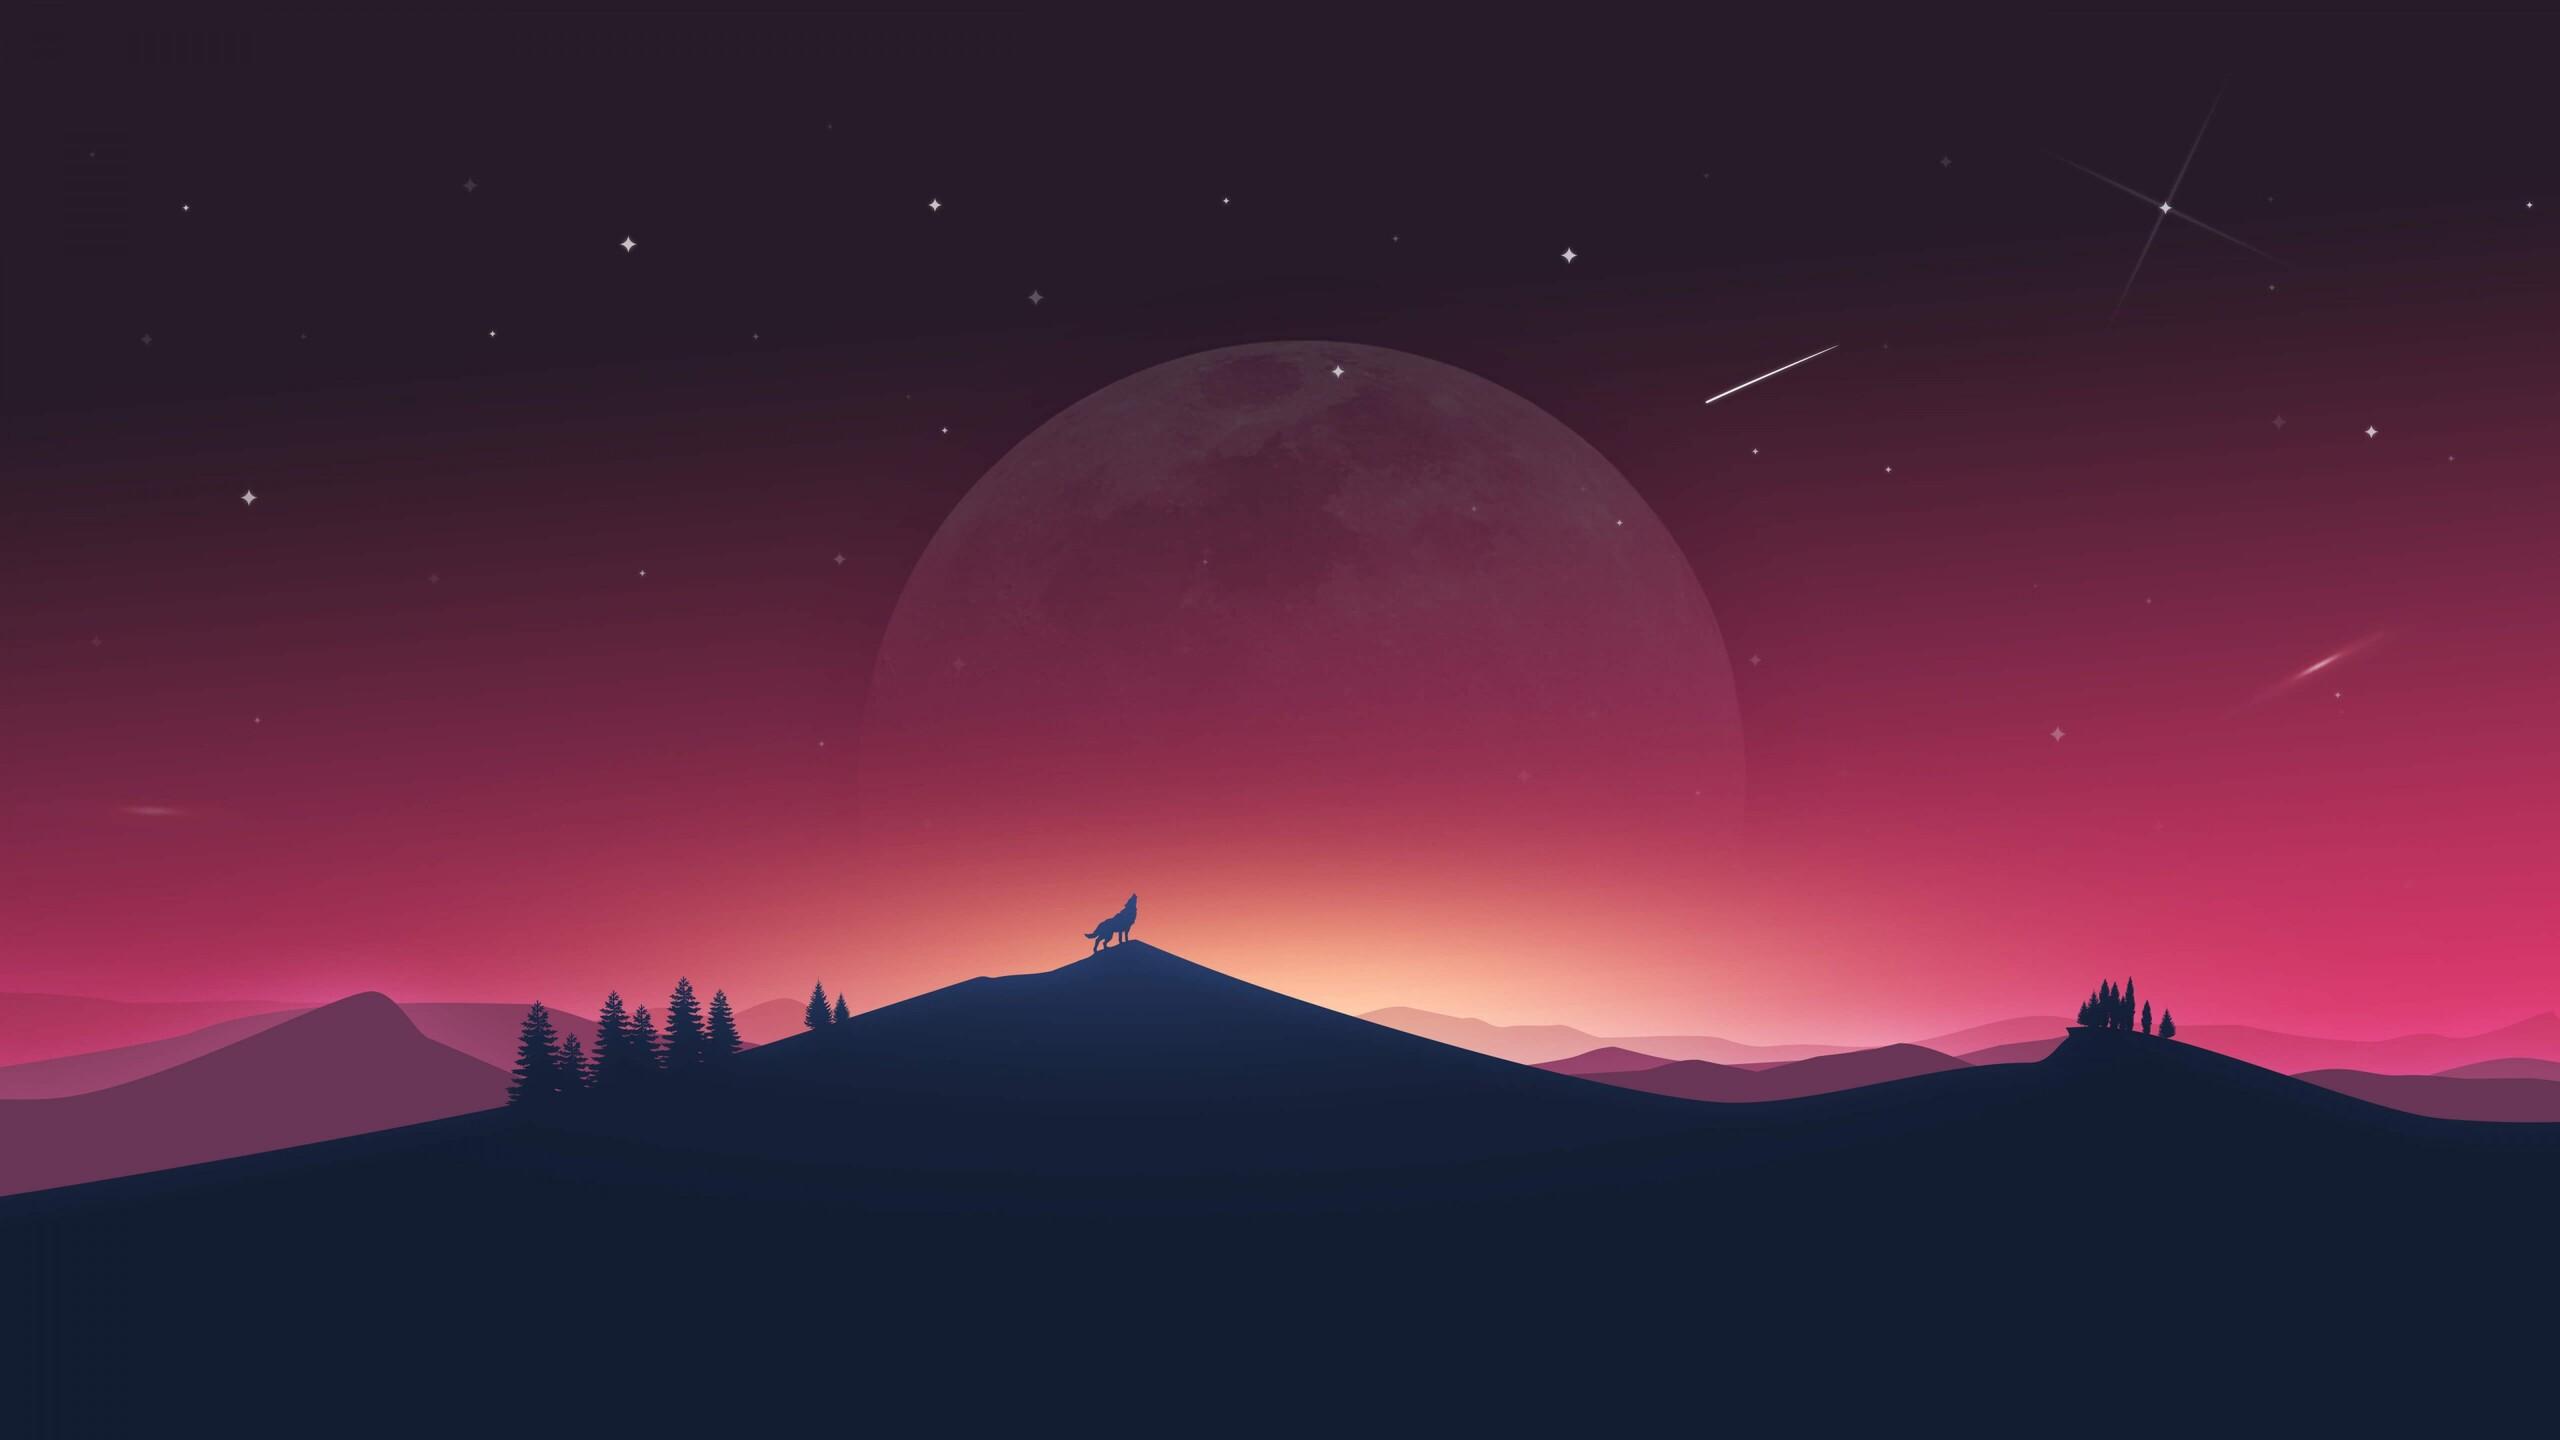 flat design wallpaper,sky,nature,red,pink,atmosphere